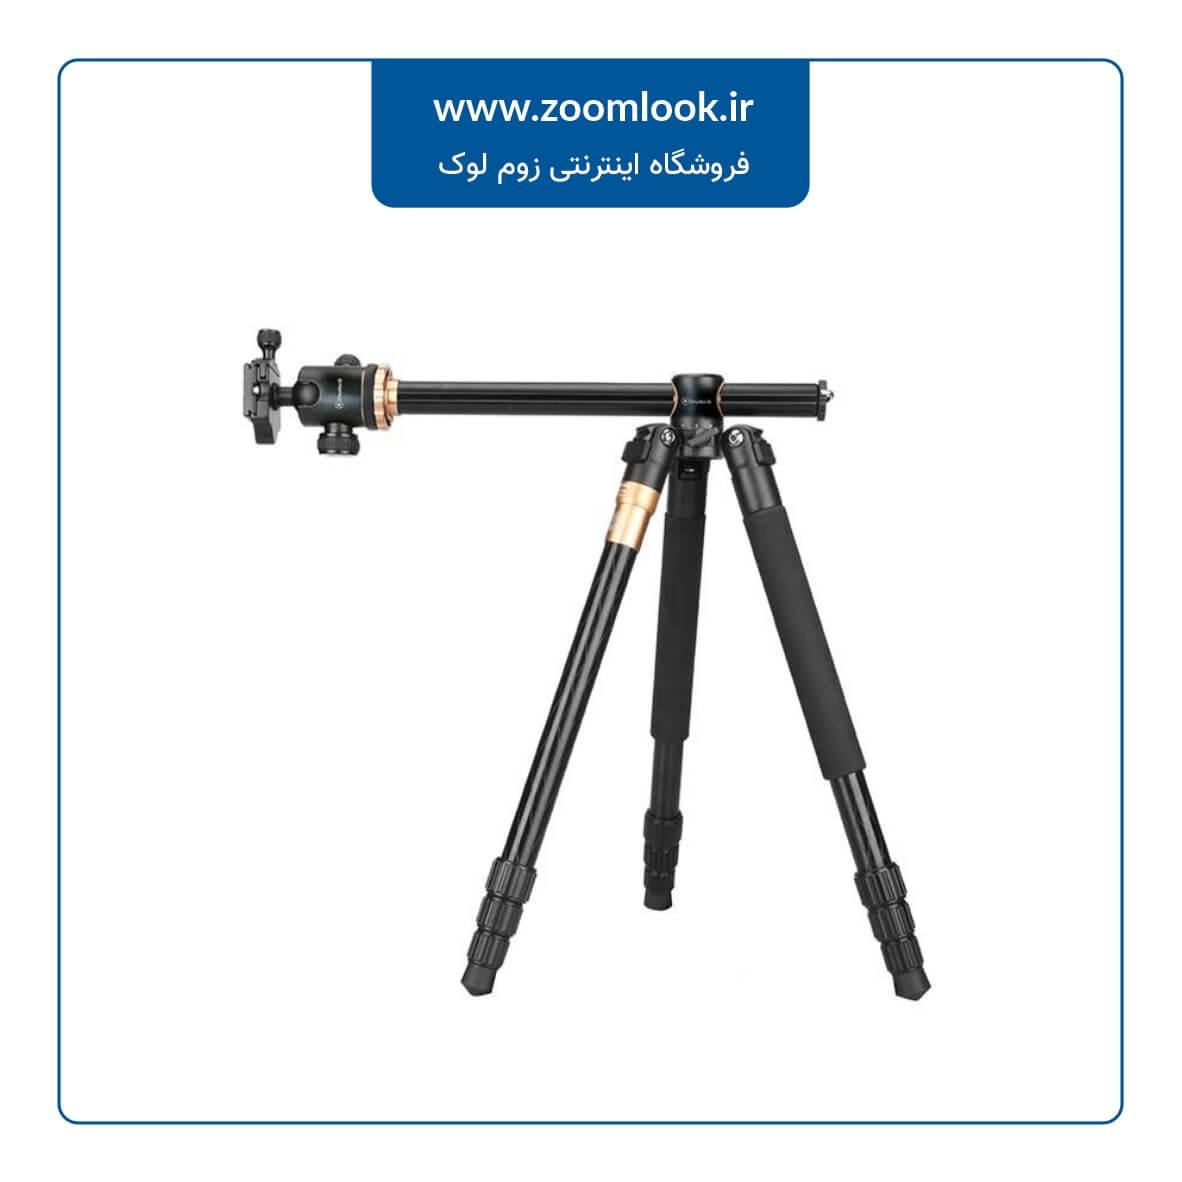 سه پایه عکاسی Fotomax FX-999H